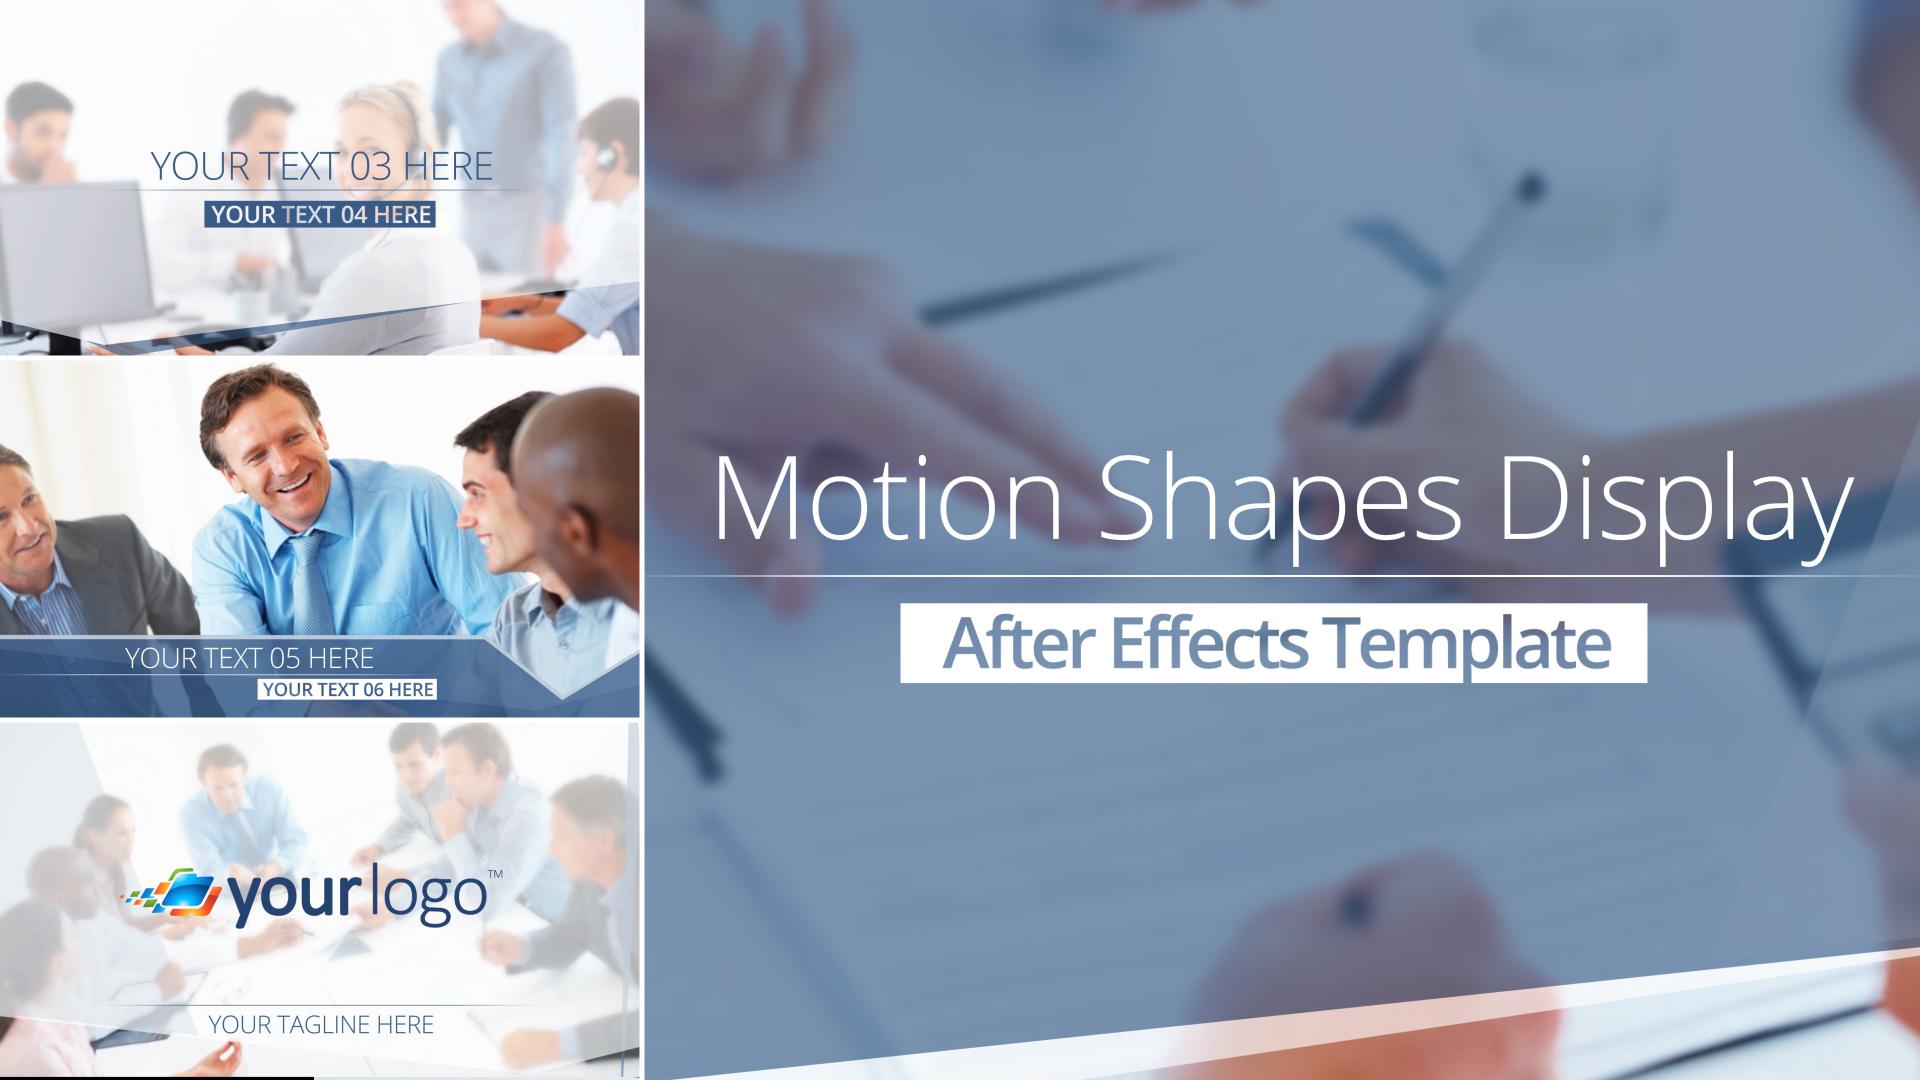 motion shapes display after effects template. Black Bedroom Furniture Sets. Home Design Ideas